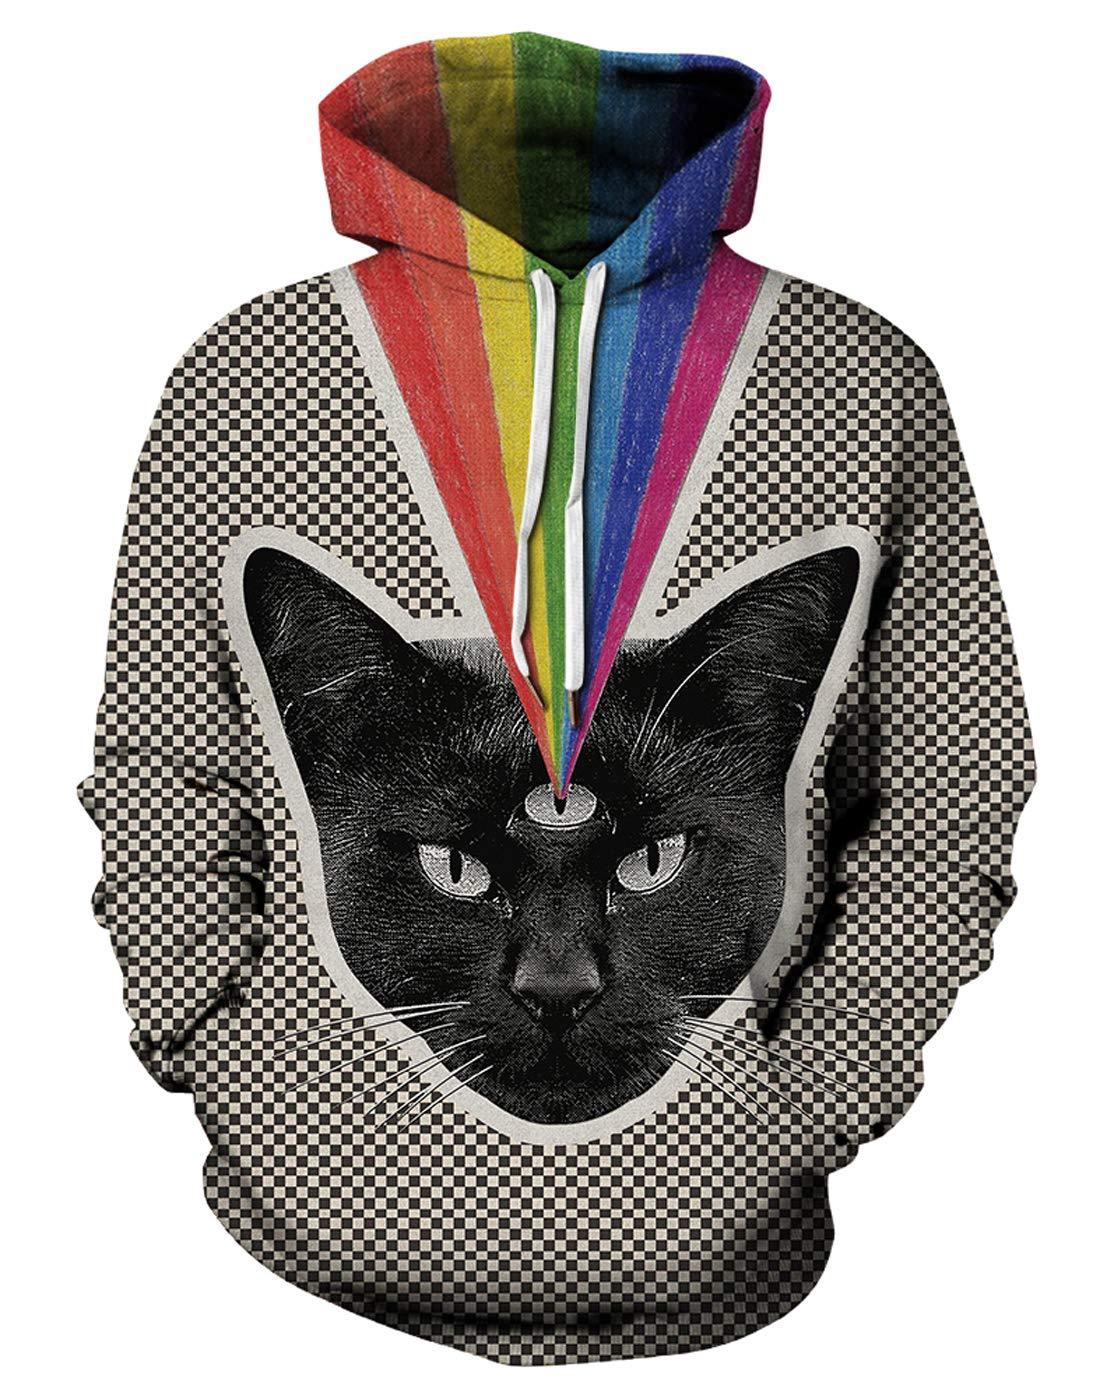 URVIP Unisex Realistic 3D Print Pullover Sweatshirt Hoodies with Big Pockets QYDM-439 L/XL by URVIP